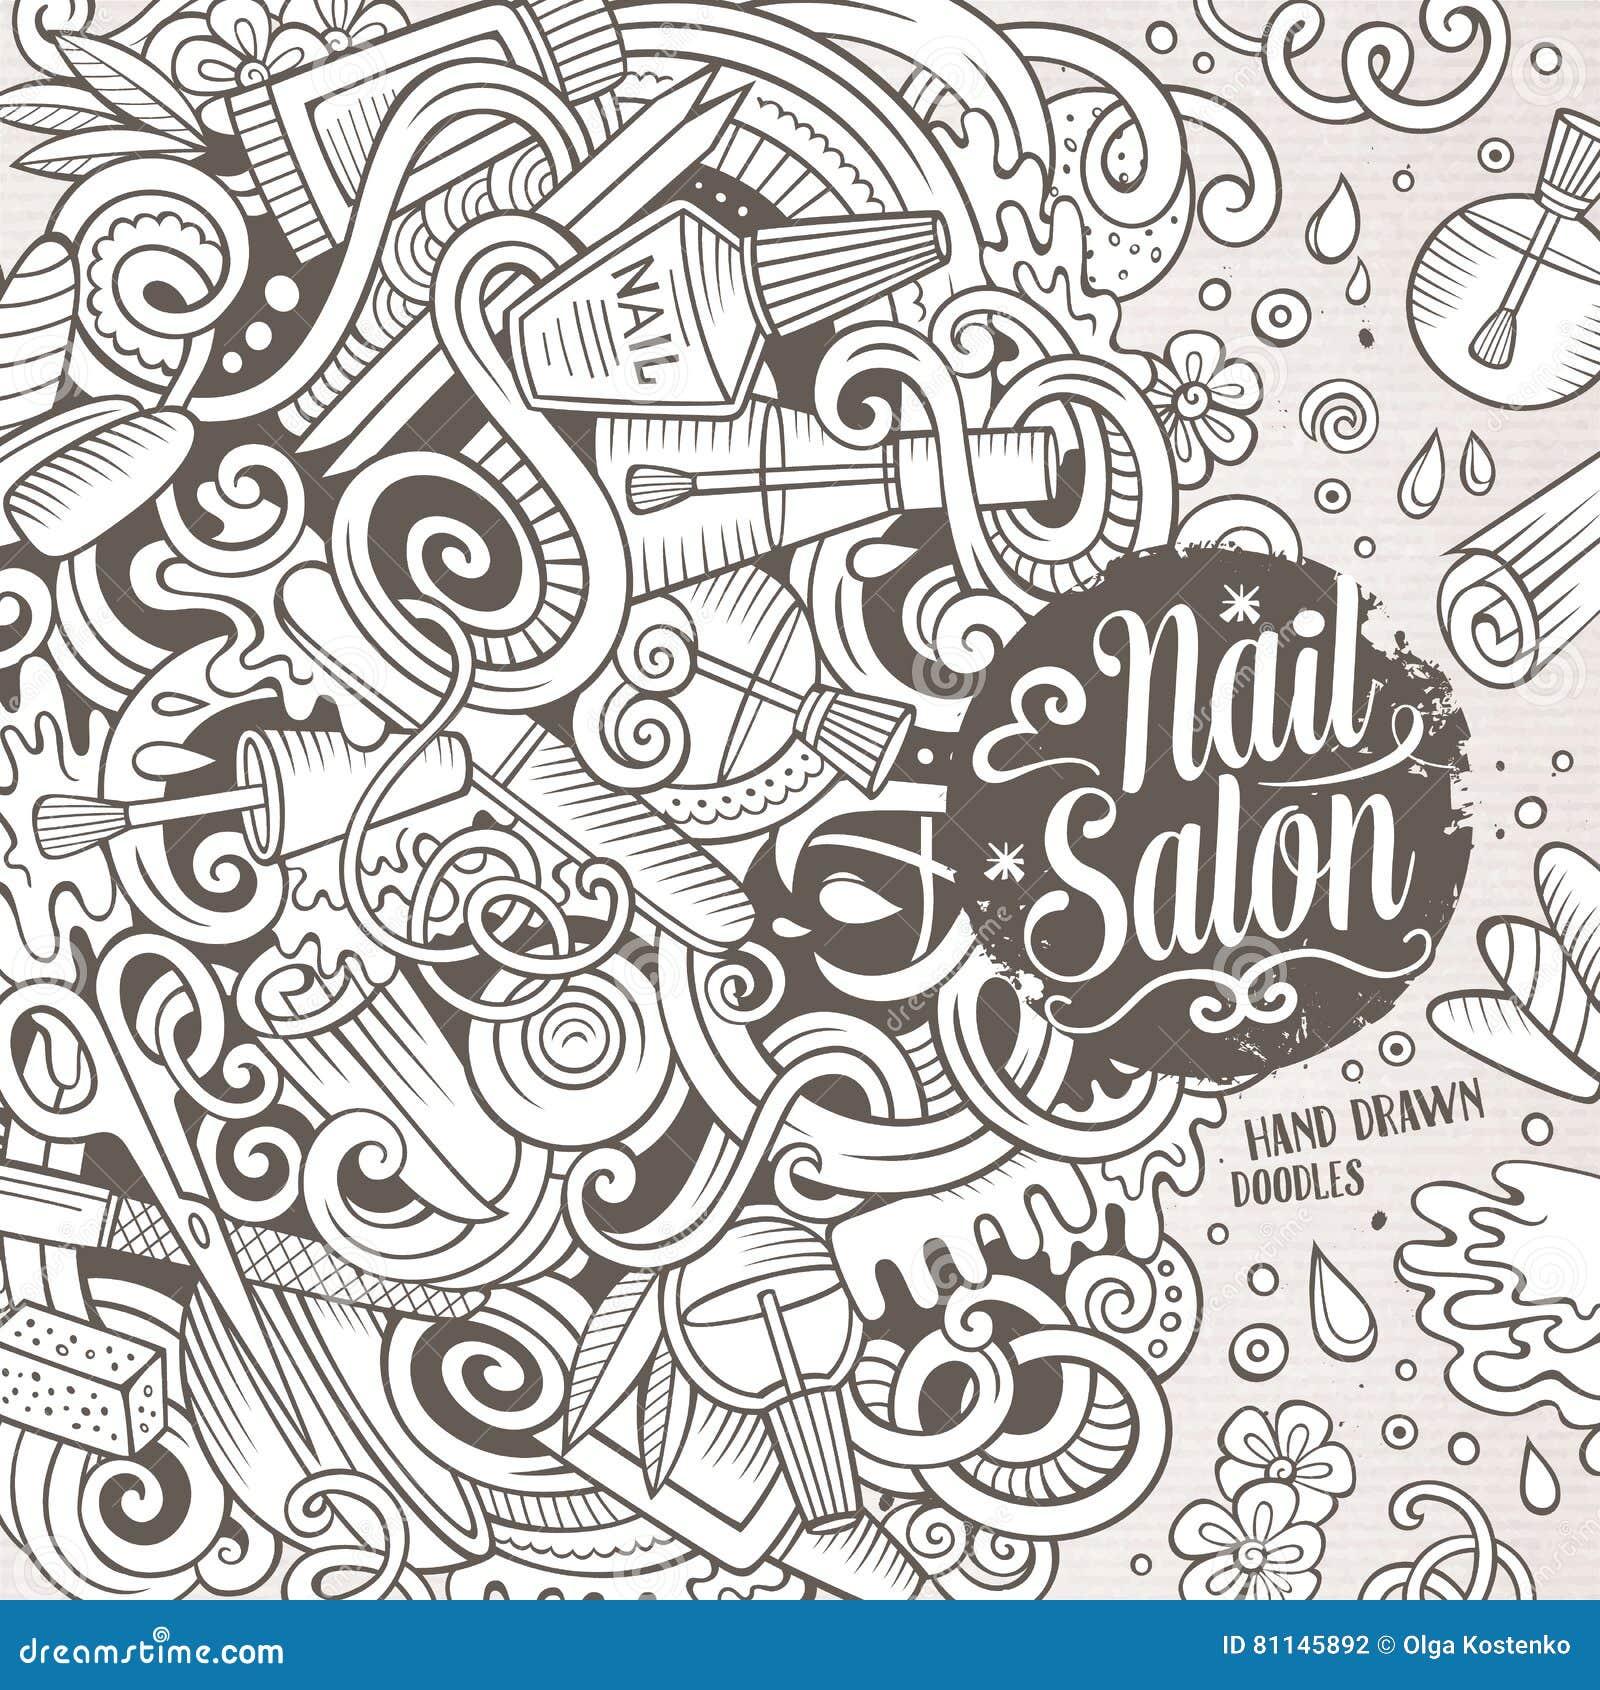 Cartoon Doodles Nail Salon Frame Design Stock Vector - Illustration ...